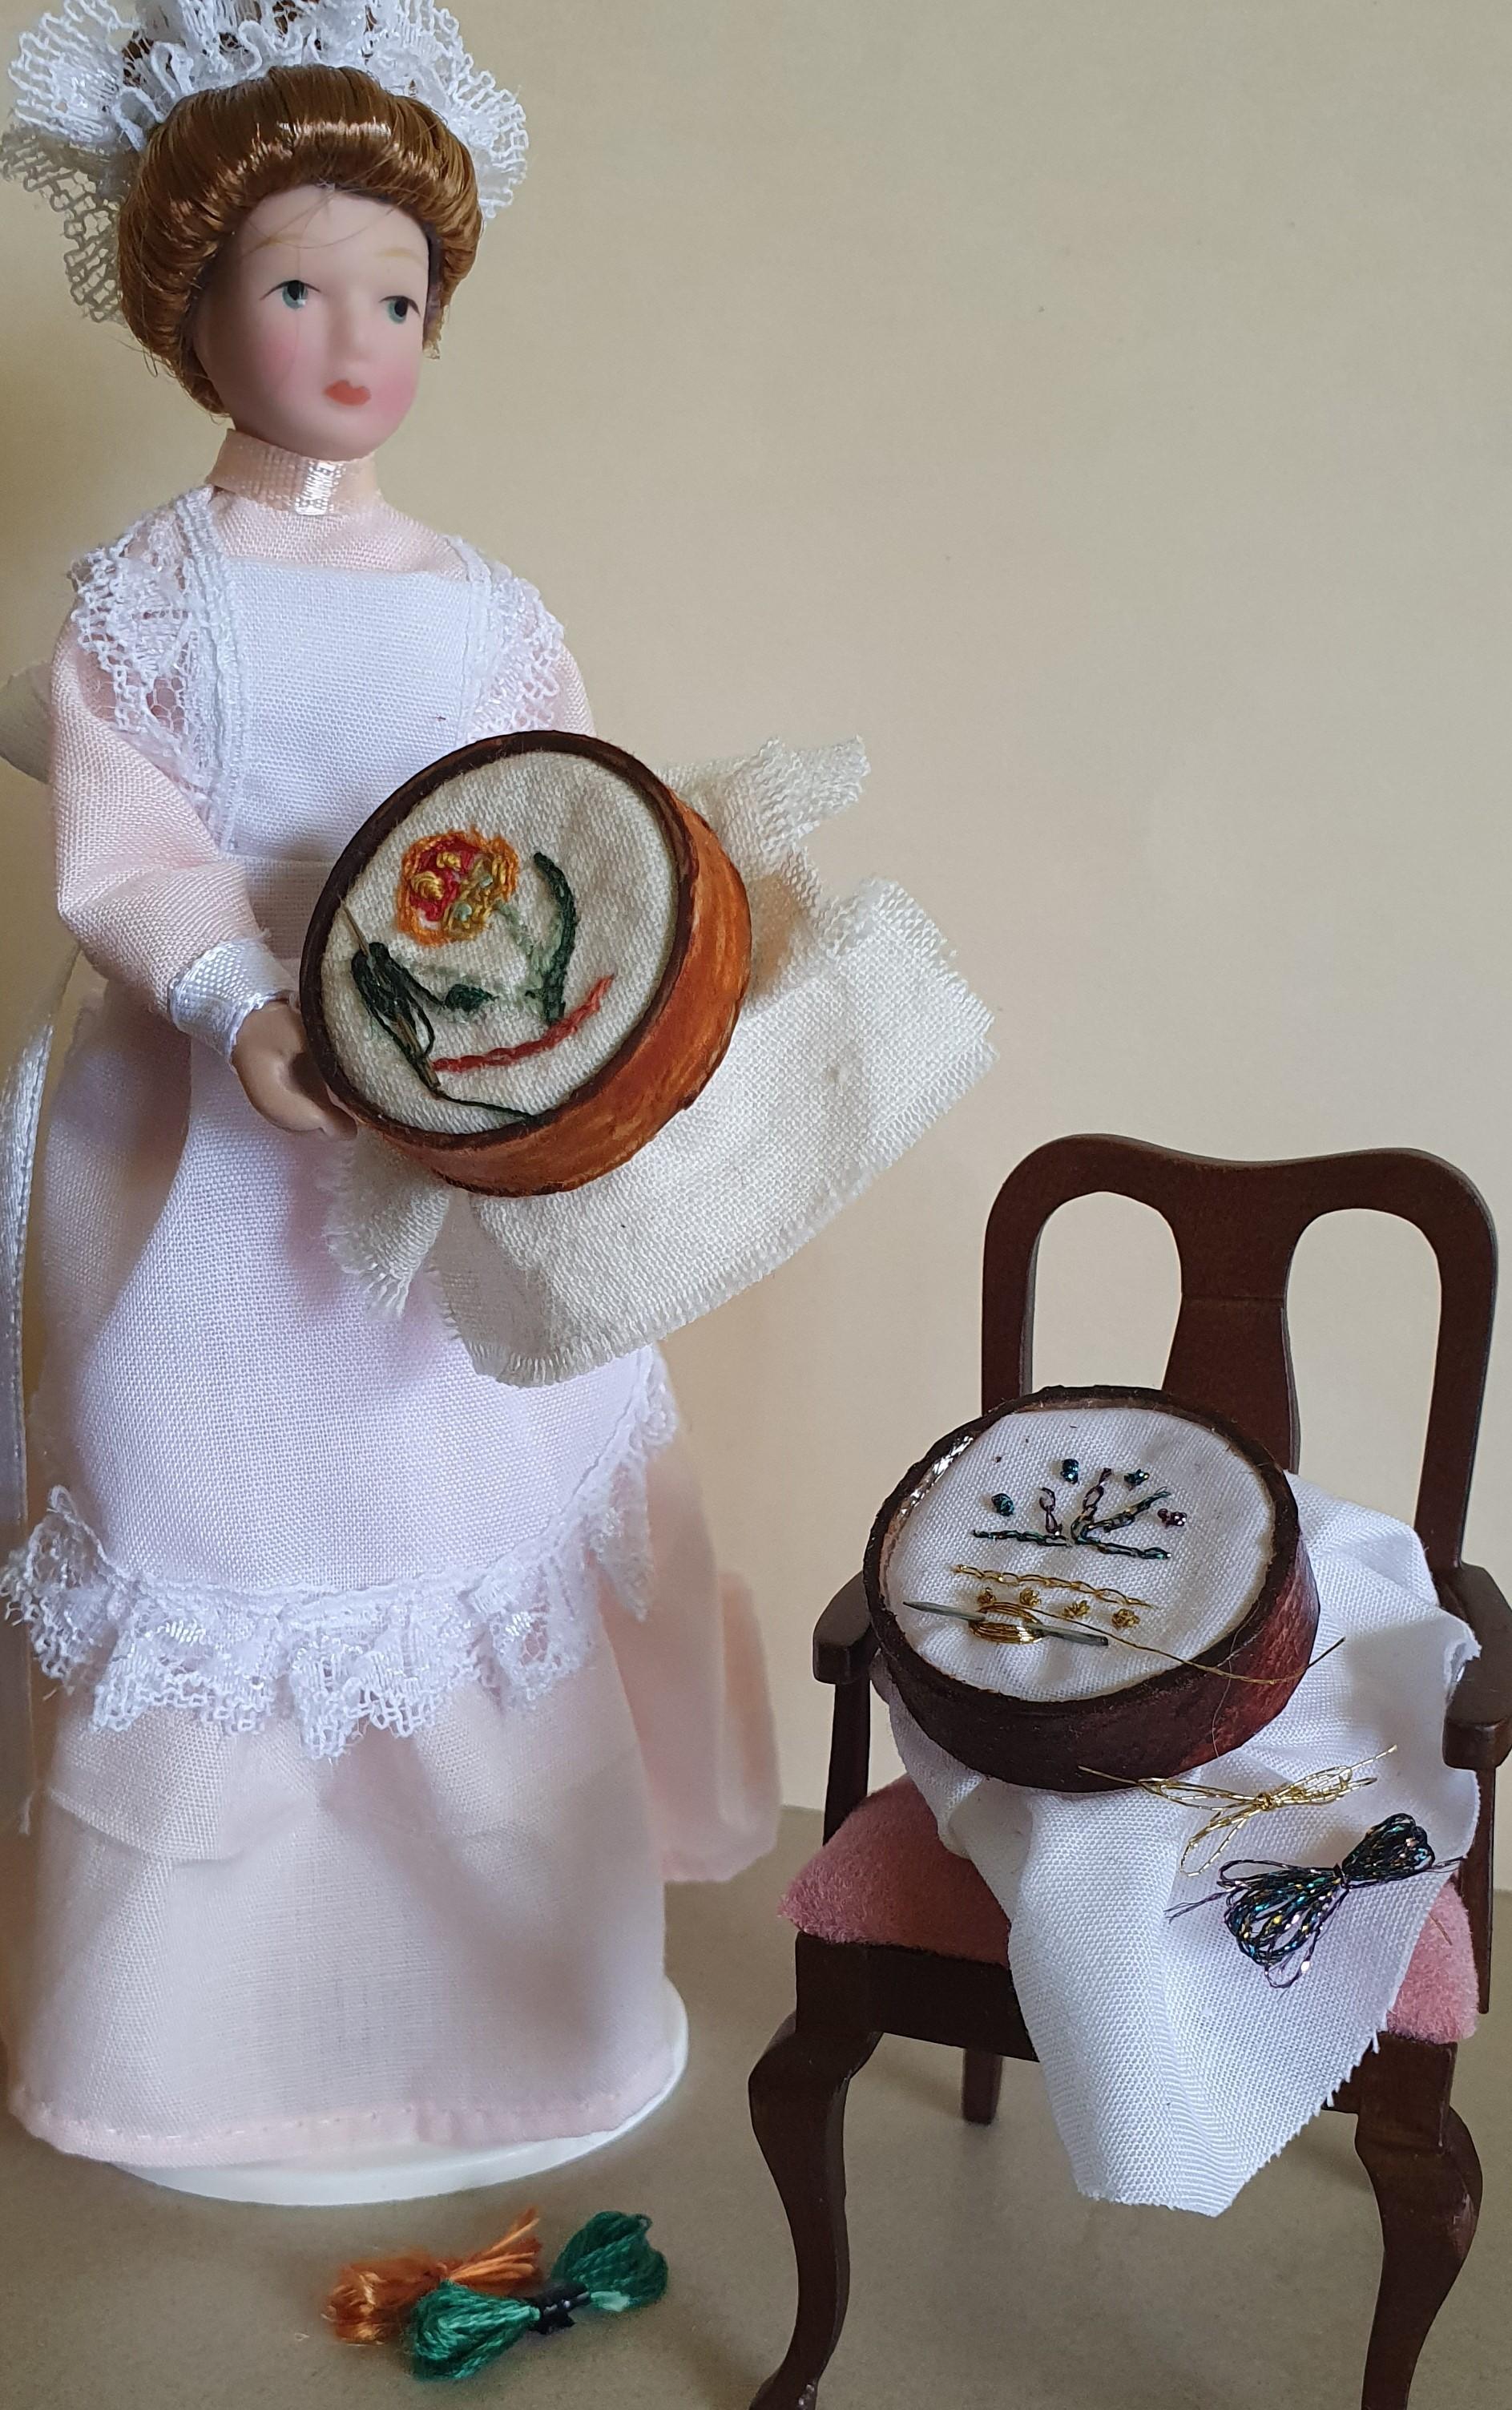 Hoop/embroidery/needle & silks $4